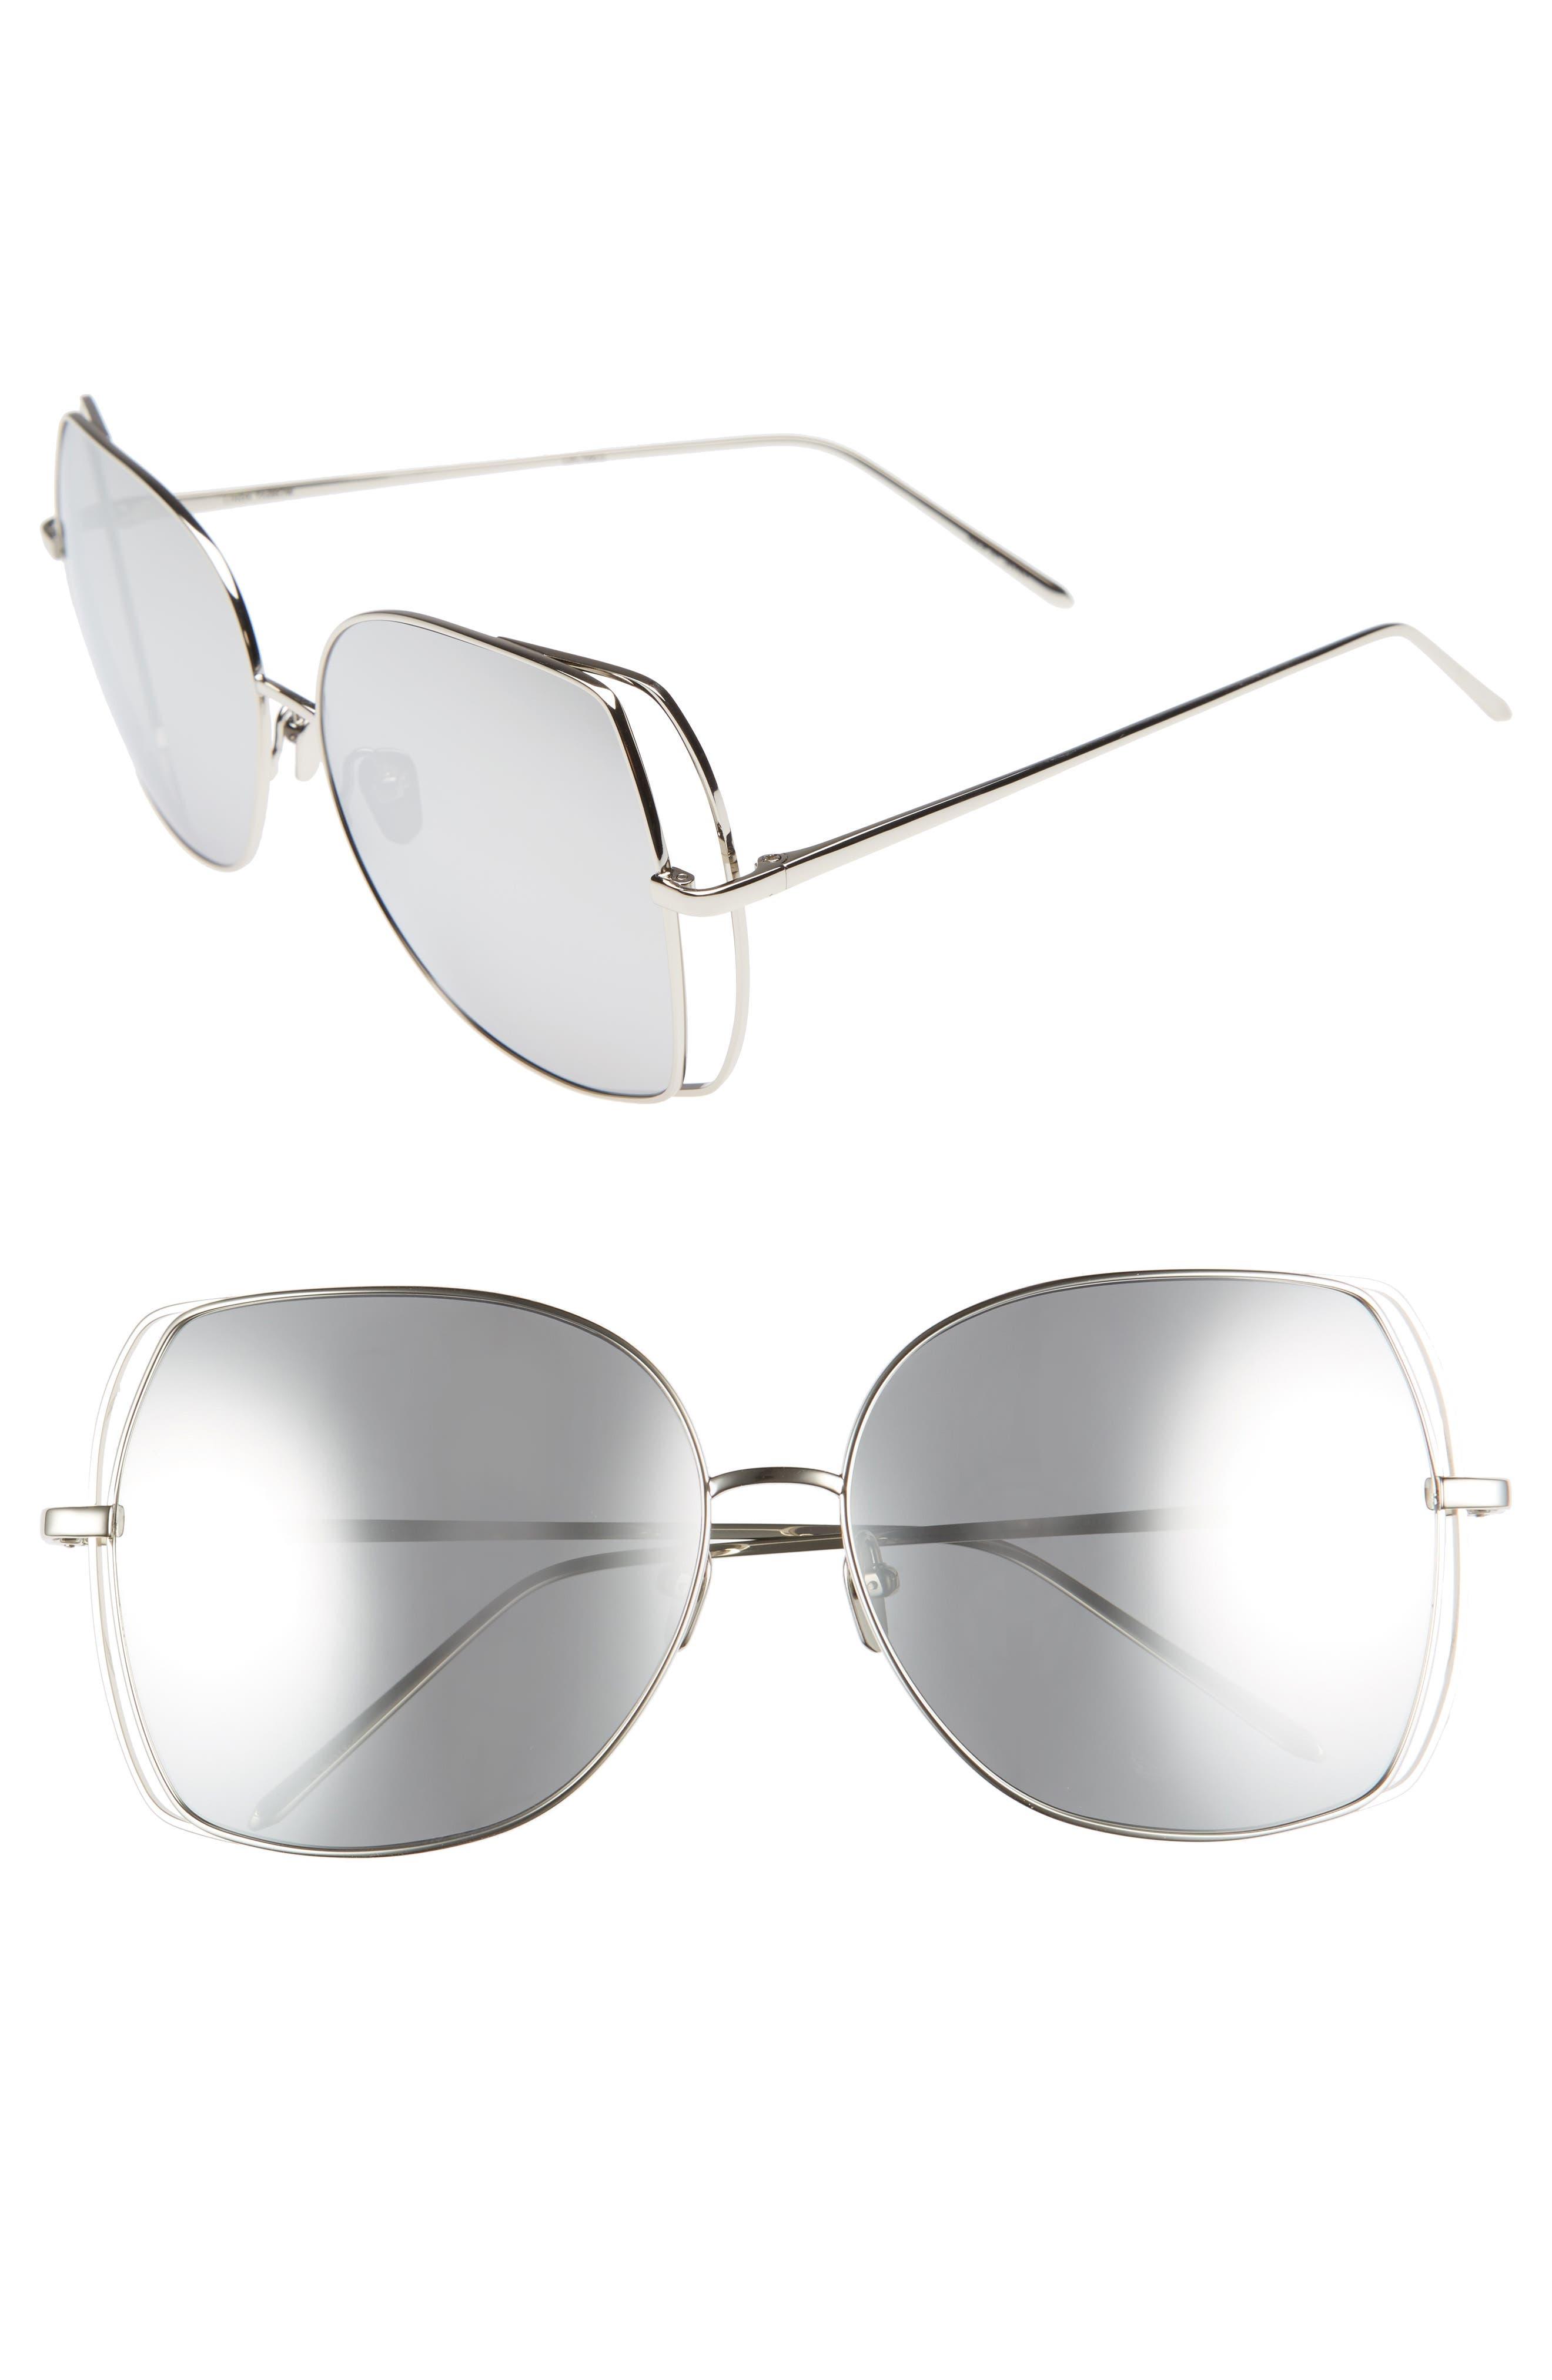 61mm Mirrored 18 Karat White Gold Sunglasses,                             Main thumbnail 1, color,